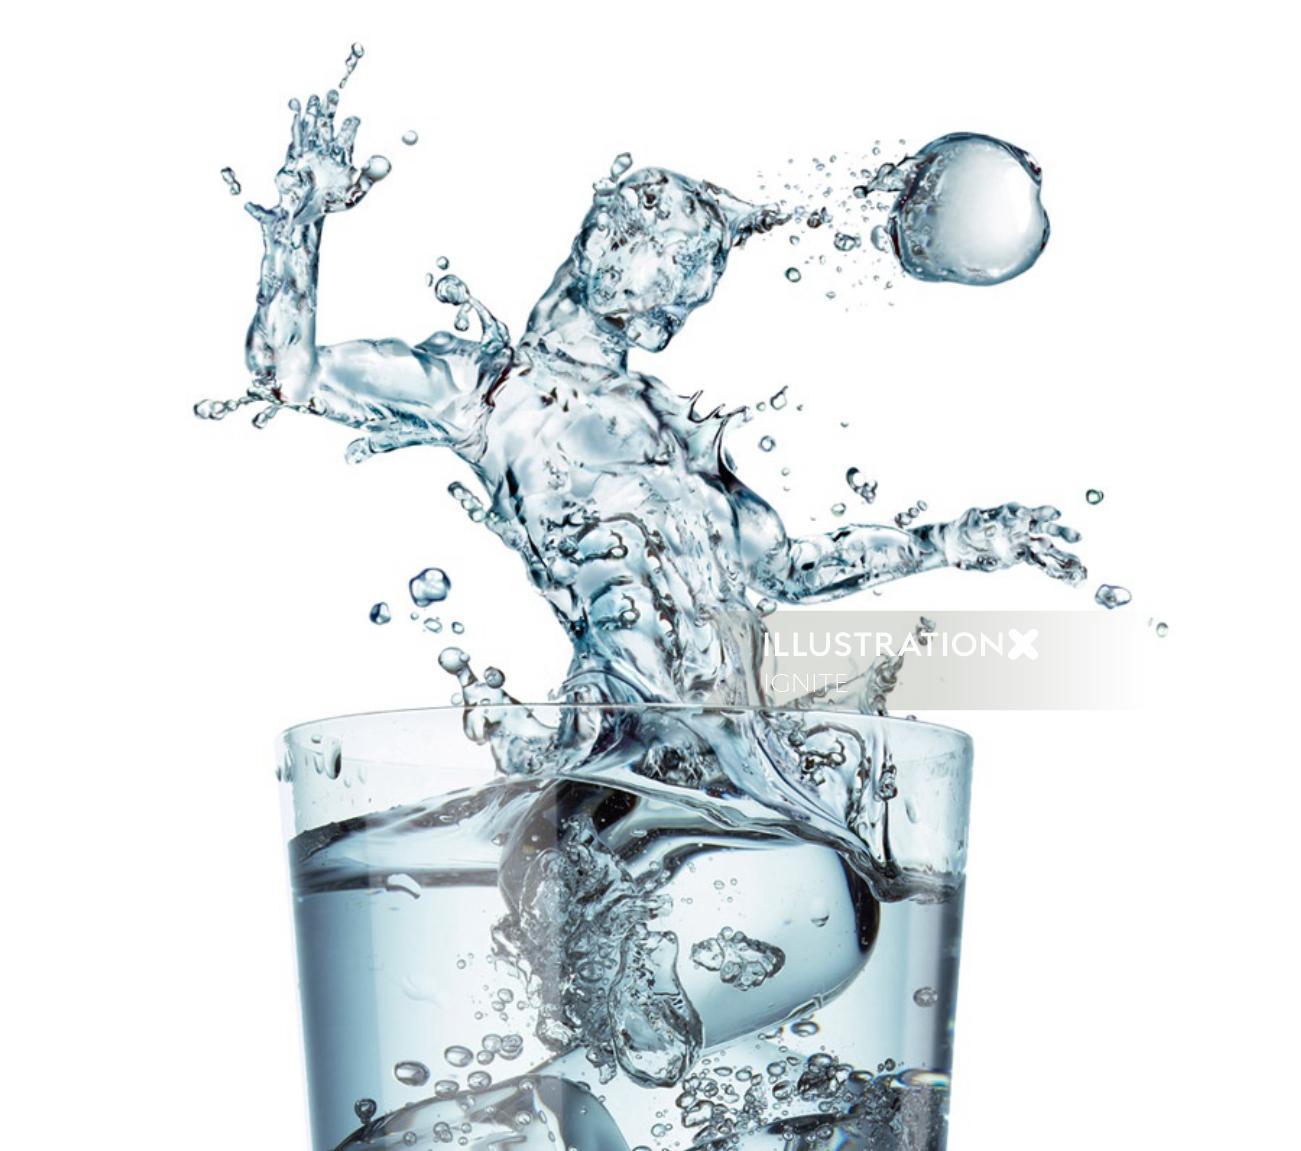 Soccer splash photorealistic illustration